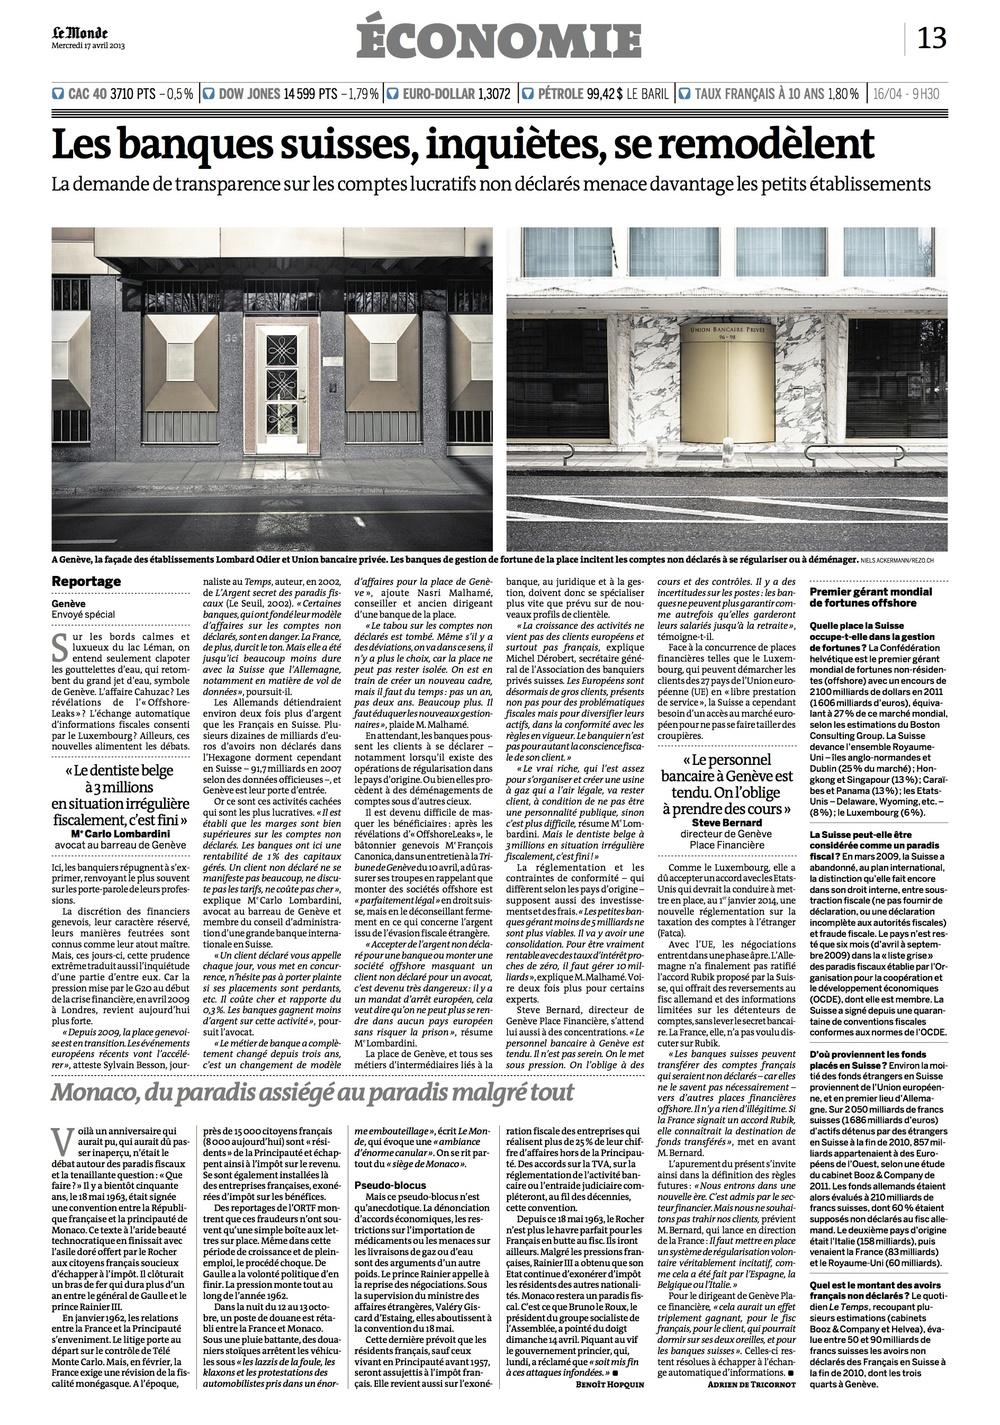 Le Monde 13-04-16.jpg